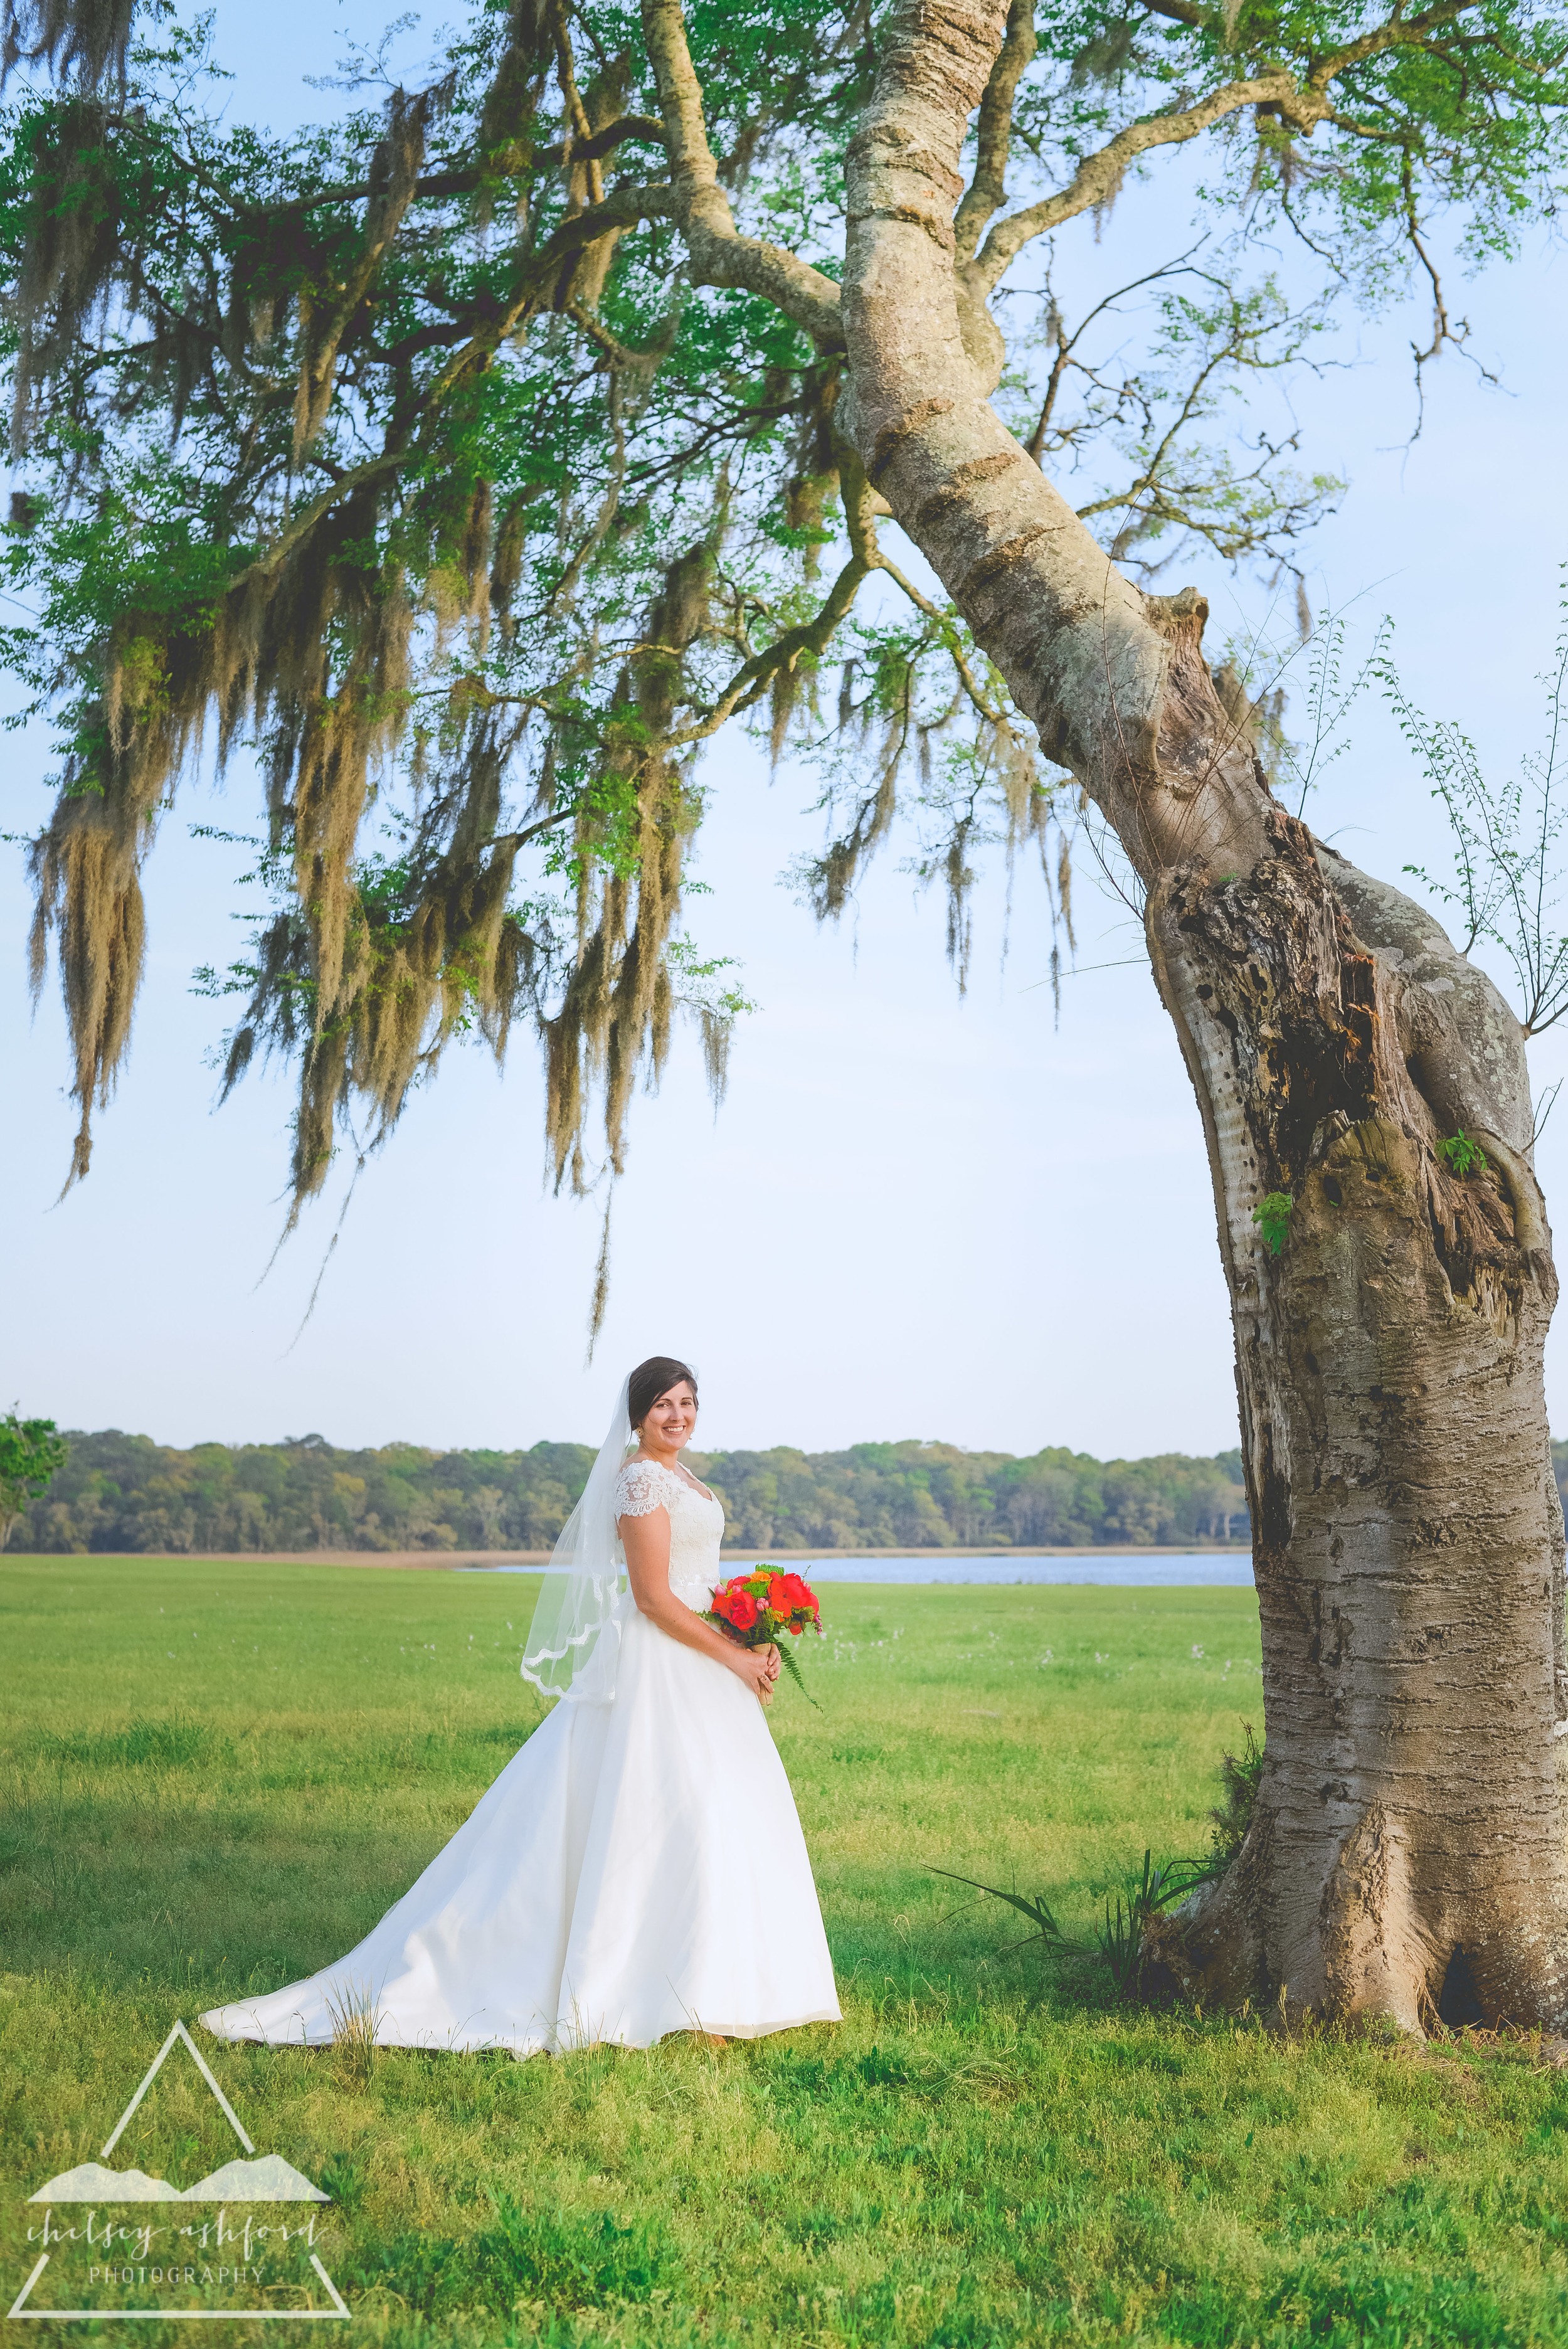 Sylvia_bridals_web-32.jpg